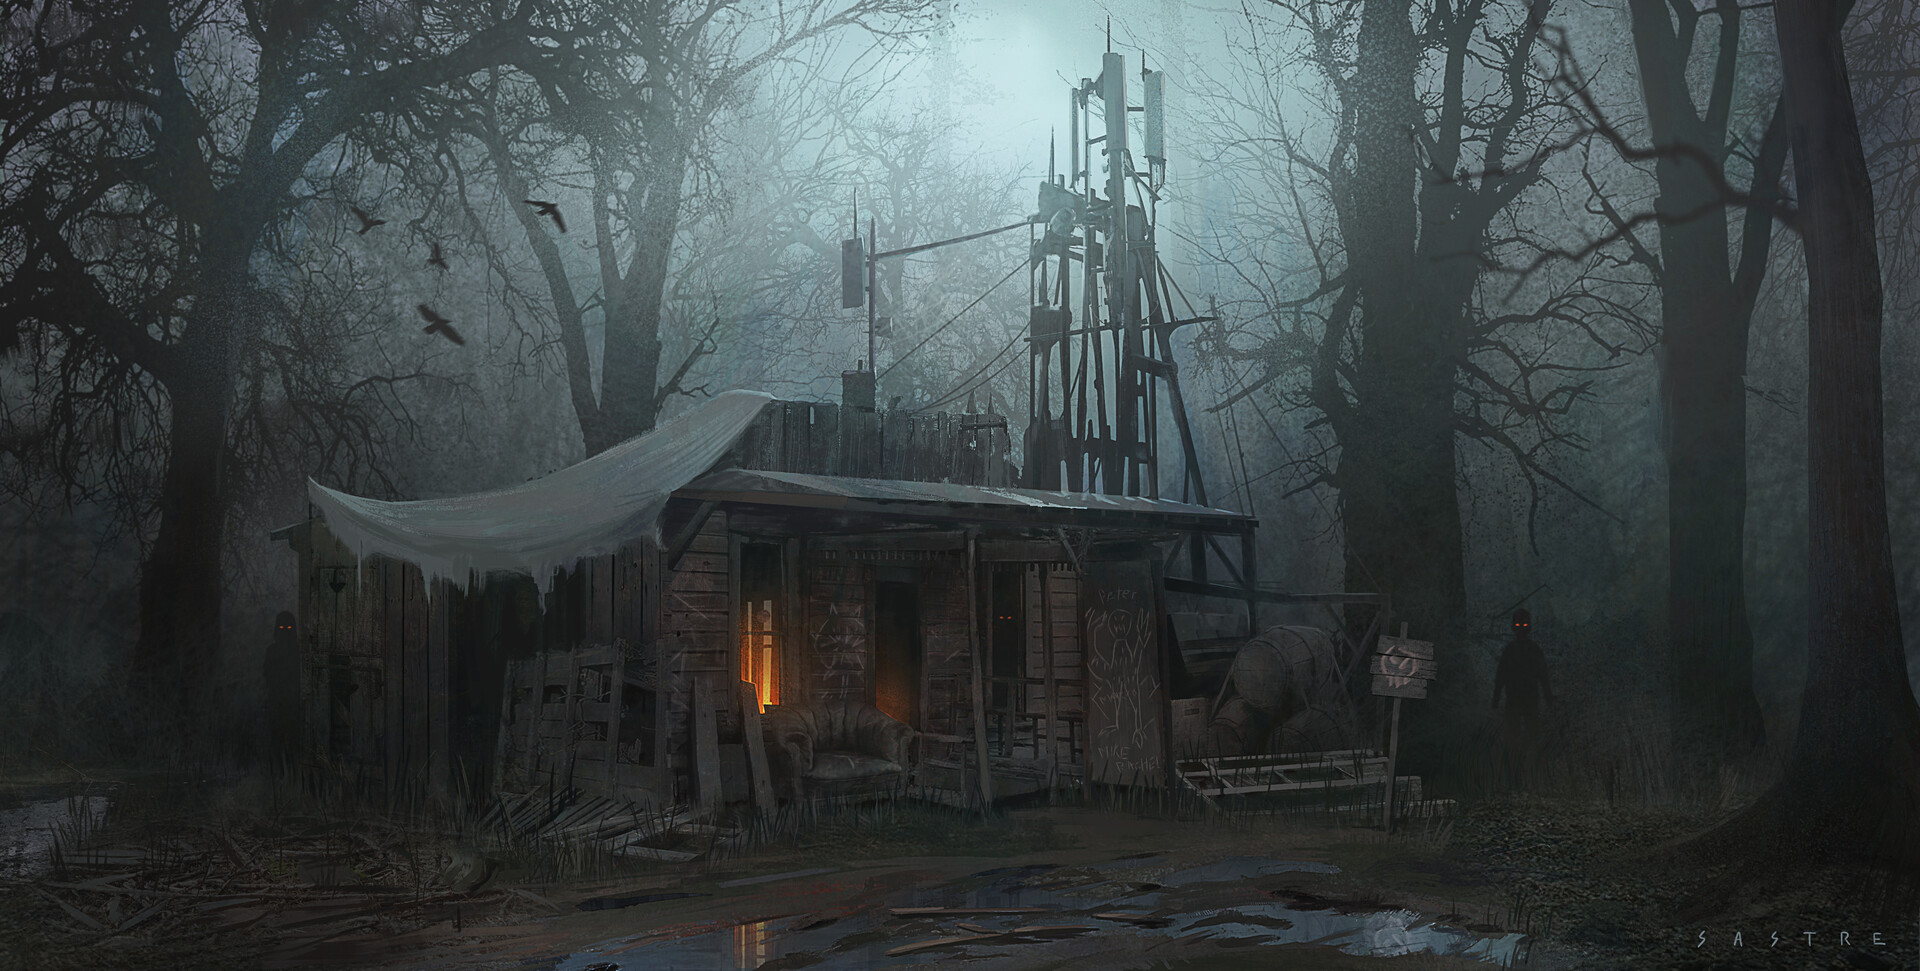 Miguel sastre forest hut final